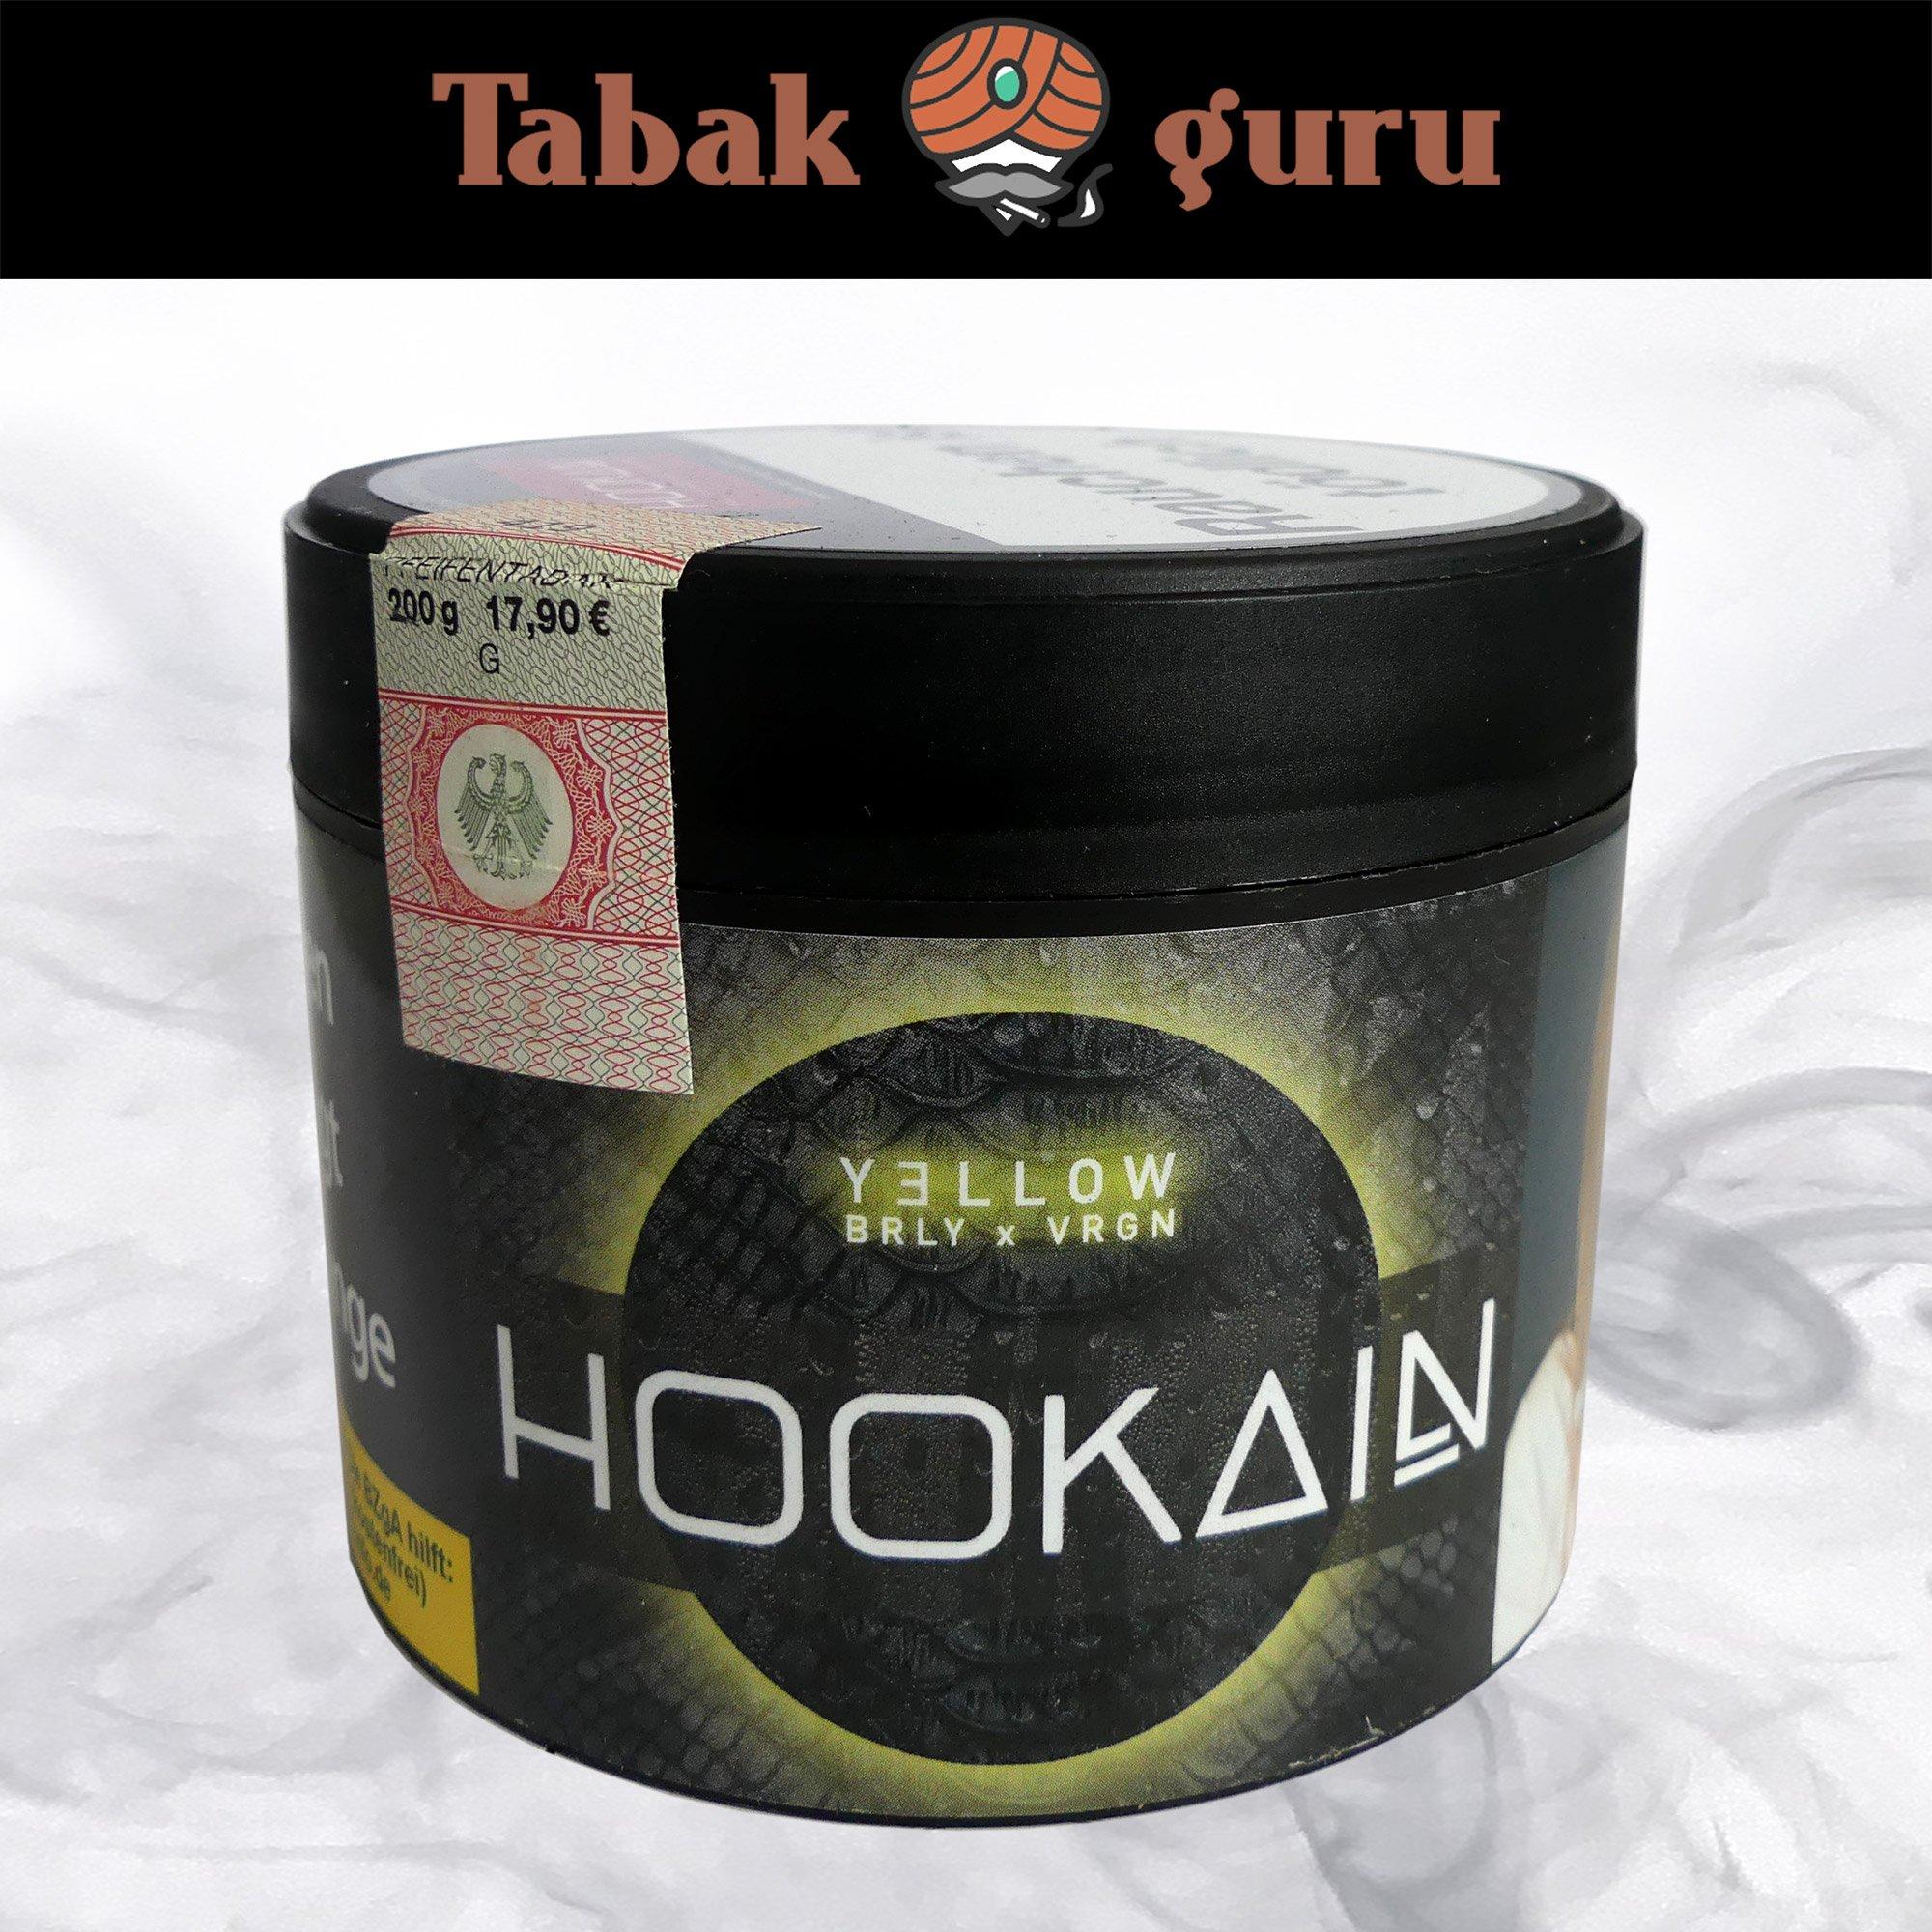 Hookain Yellow Brly x Vrgn 200g - Shisha Tabak